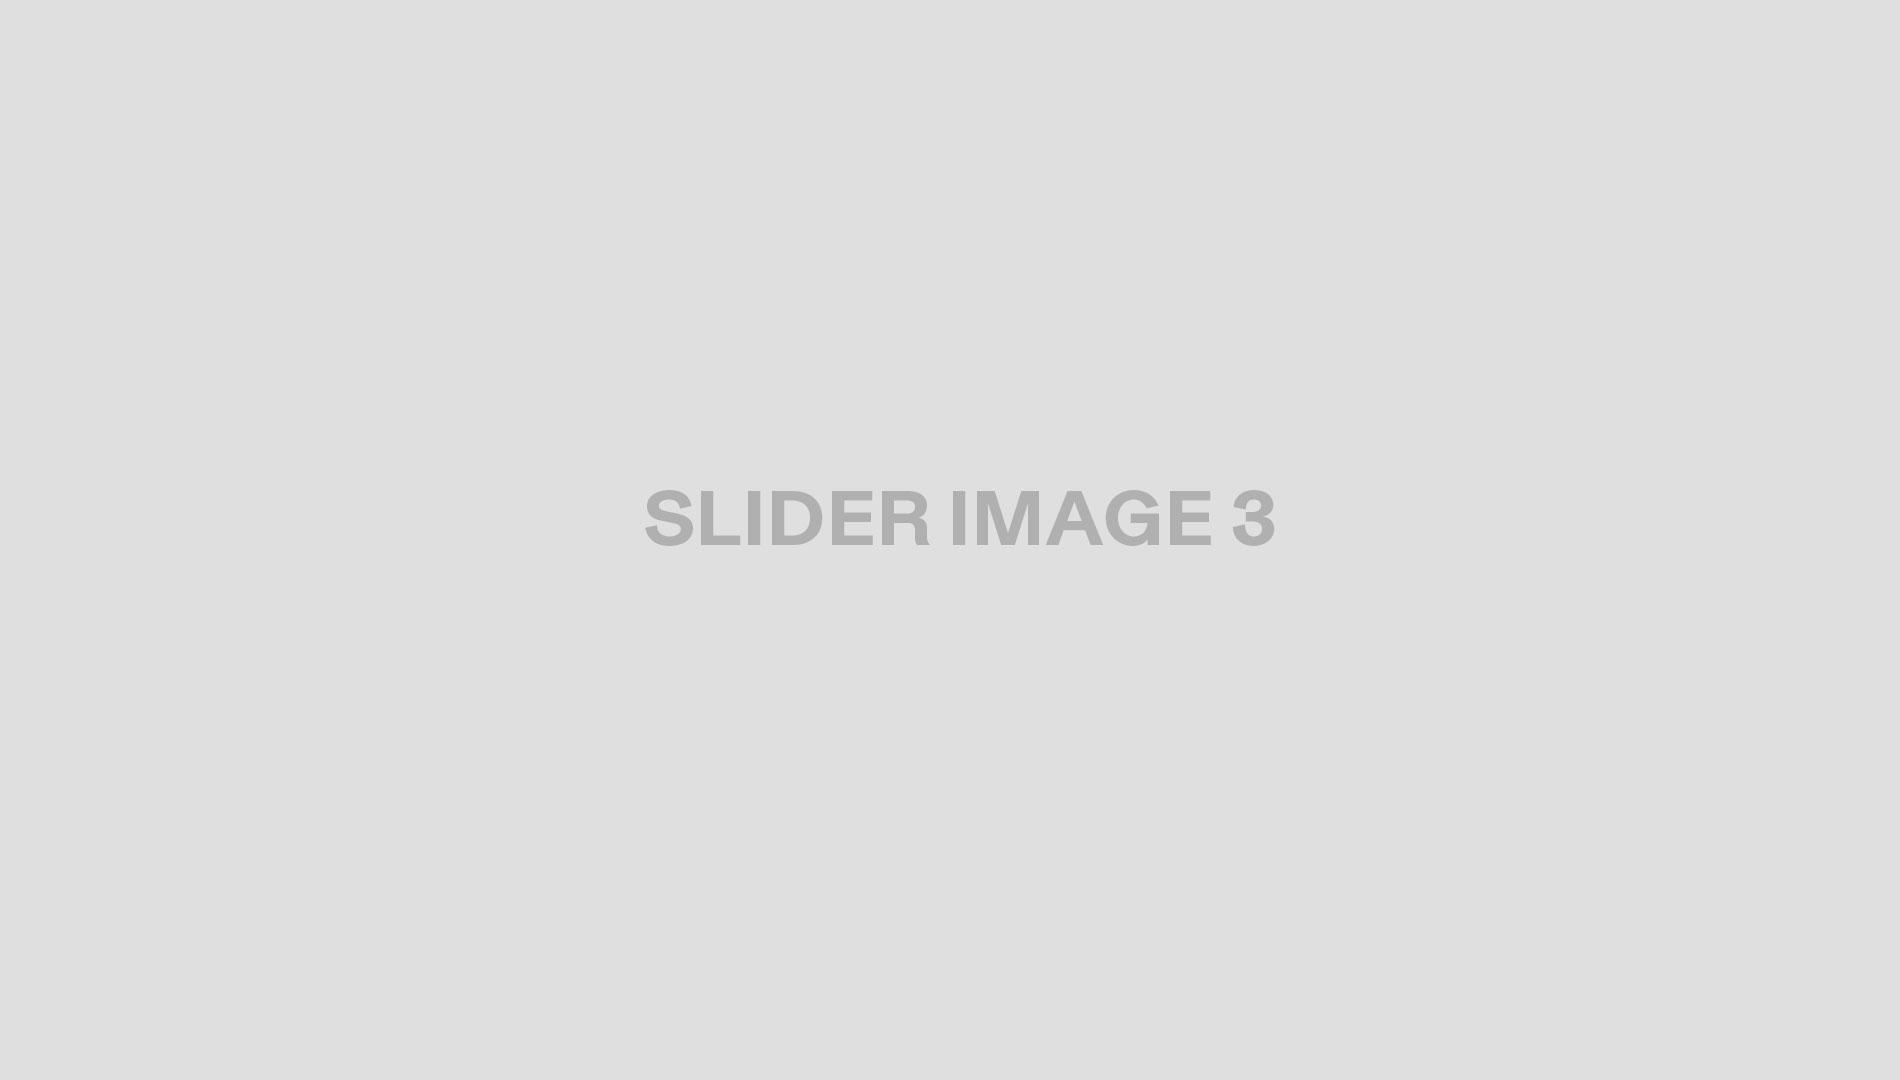 SLIDER-IMAGE-3